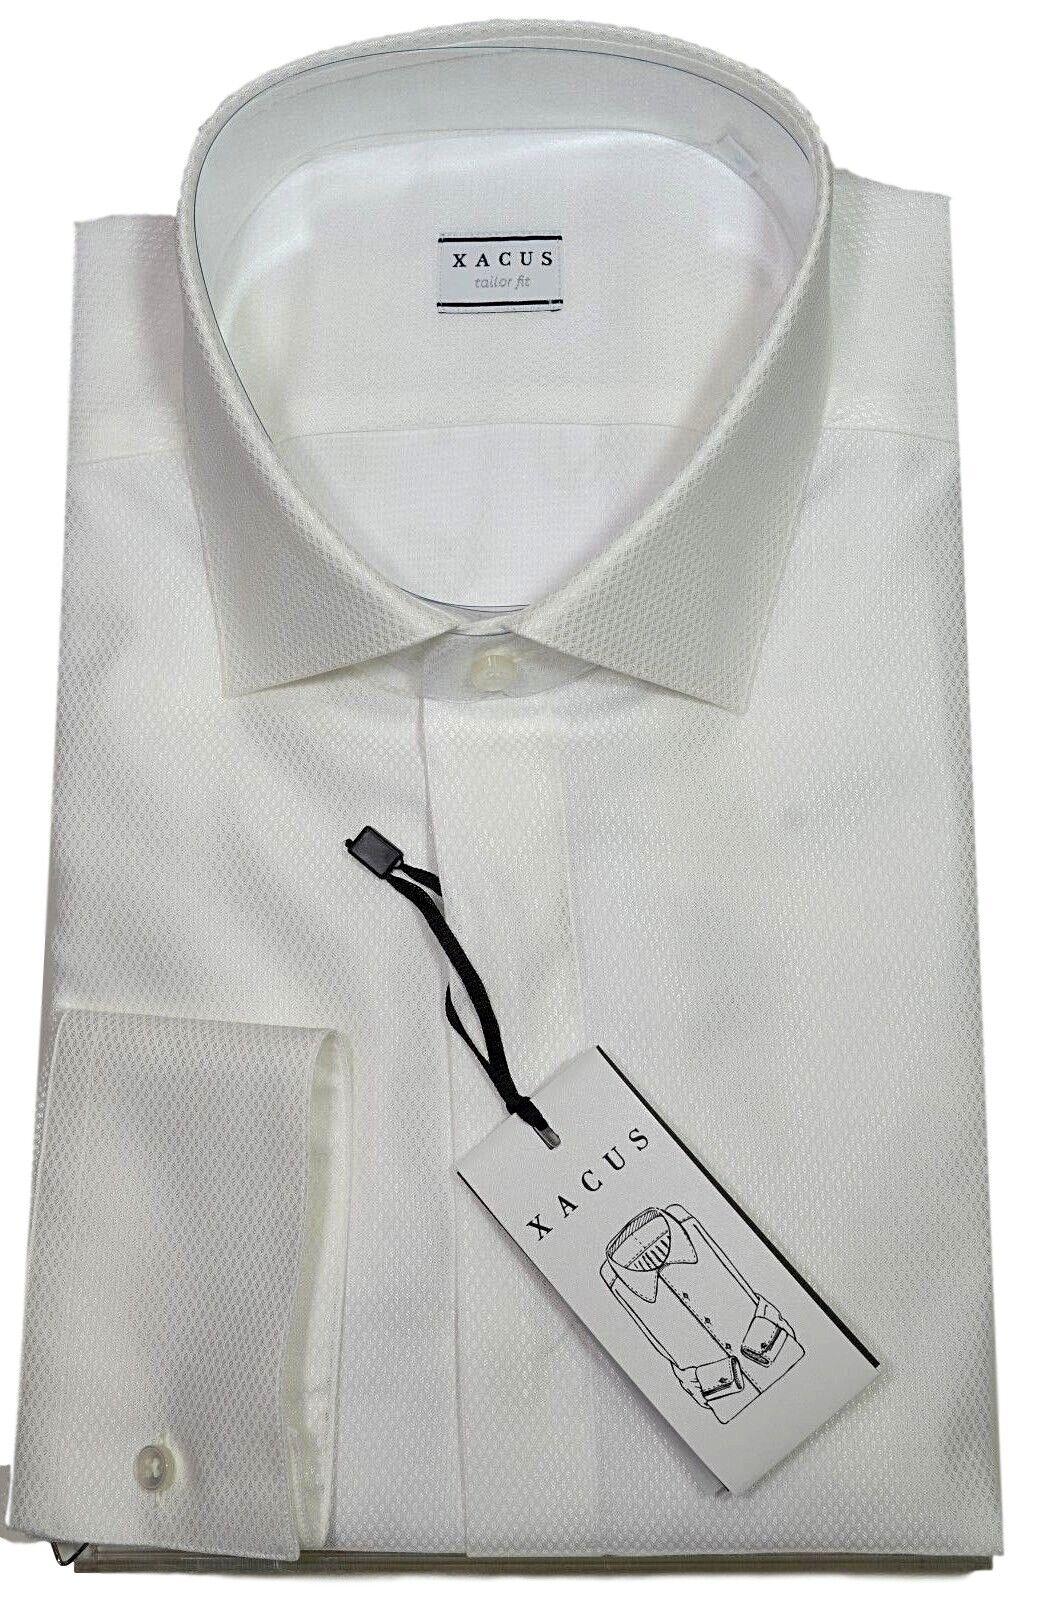 Xacus Hemd Herren Modell Tailor 21105001 Dressing' Zwischenteil Mod. Elegant